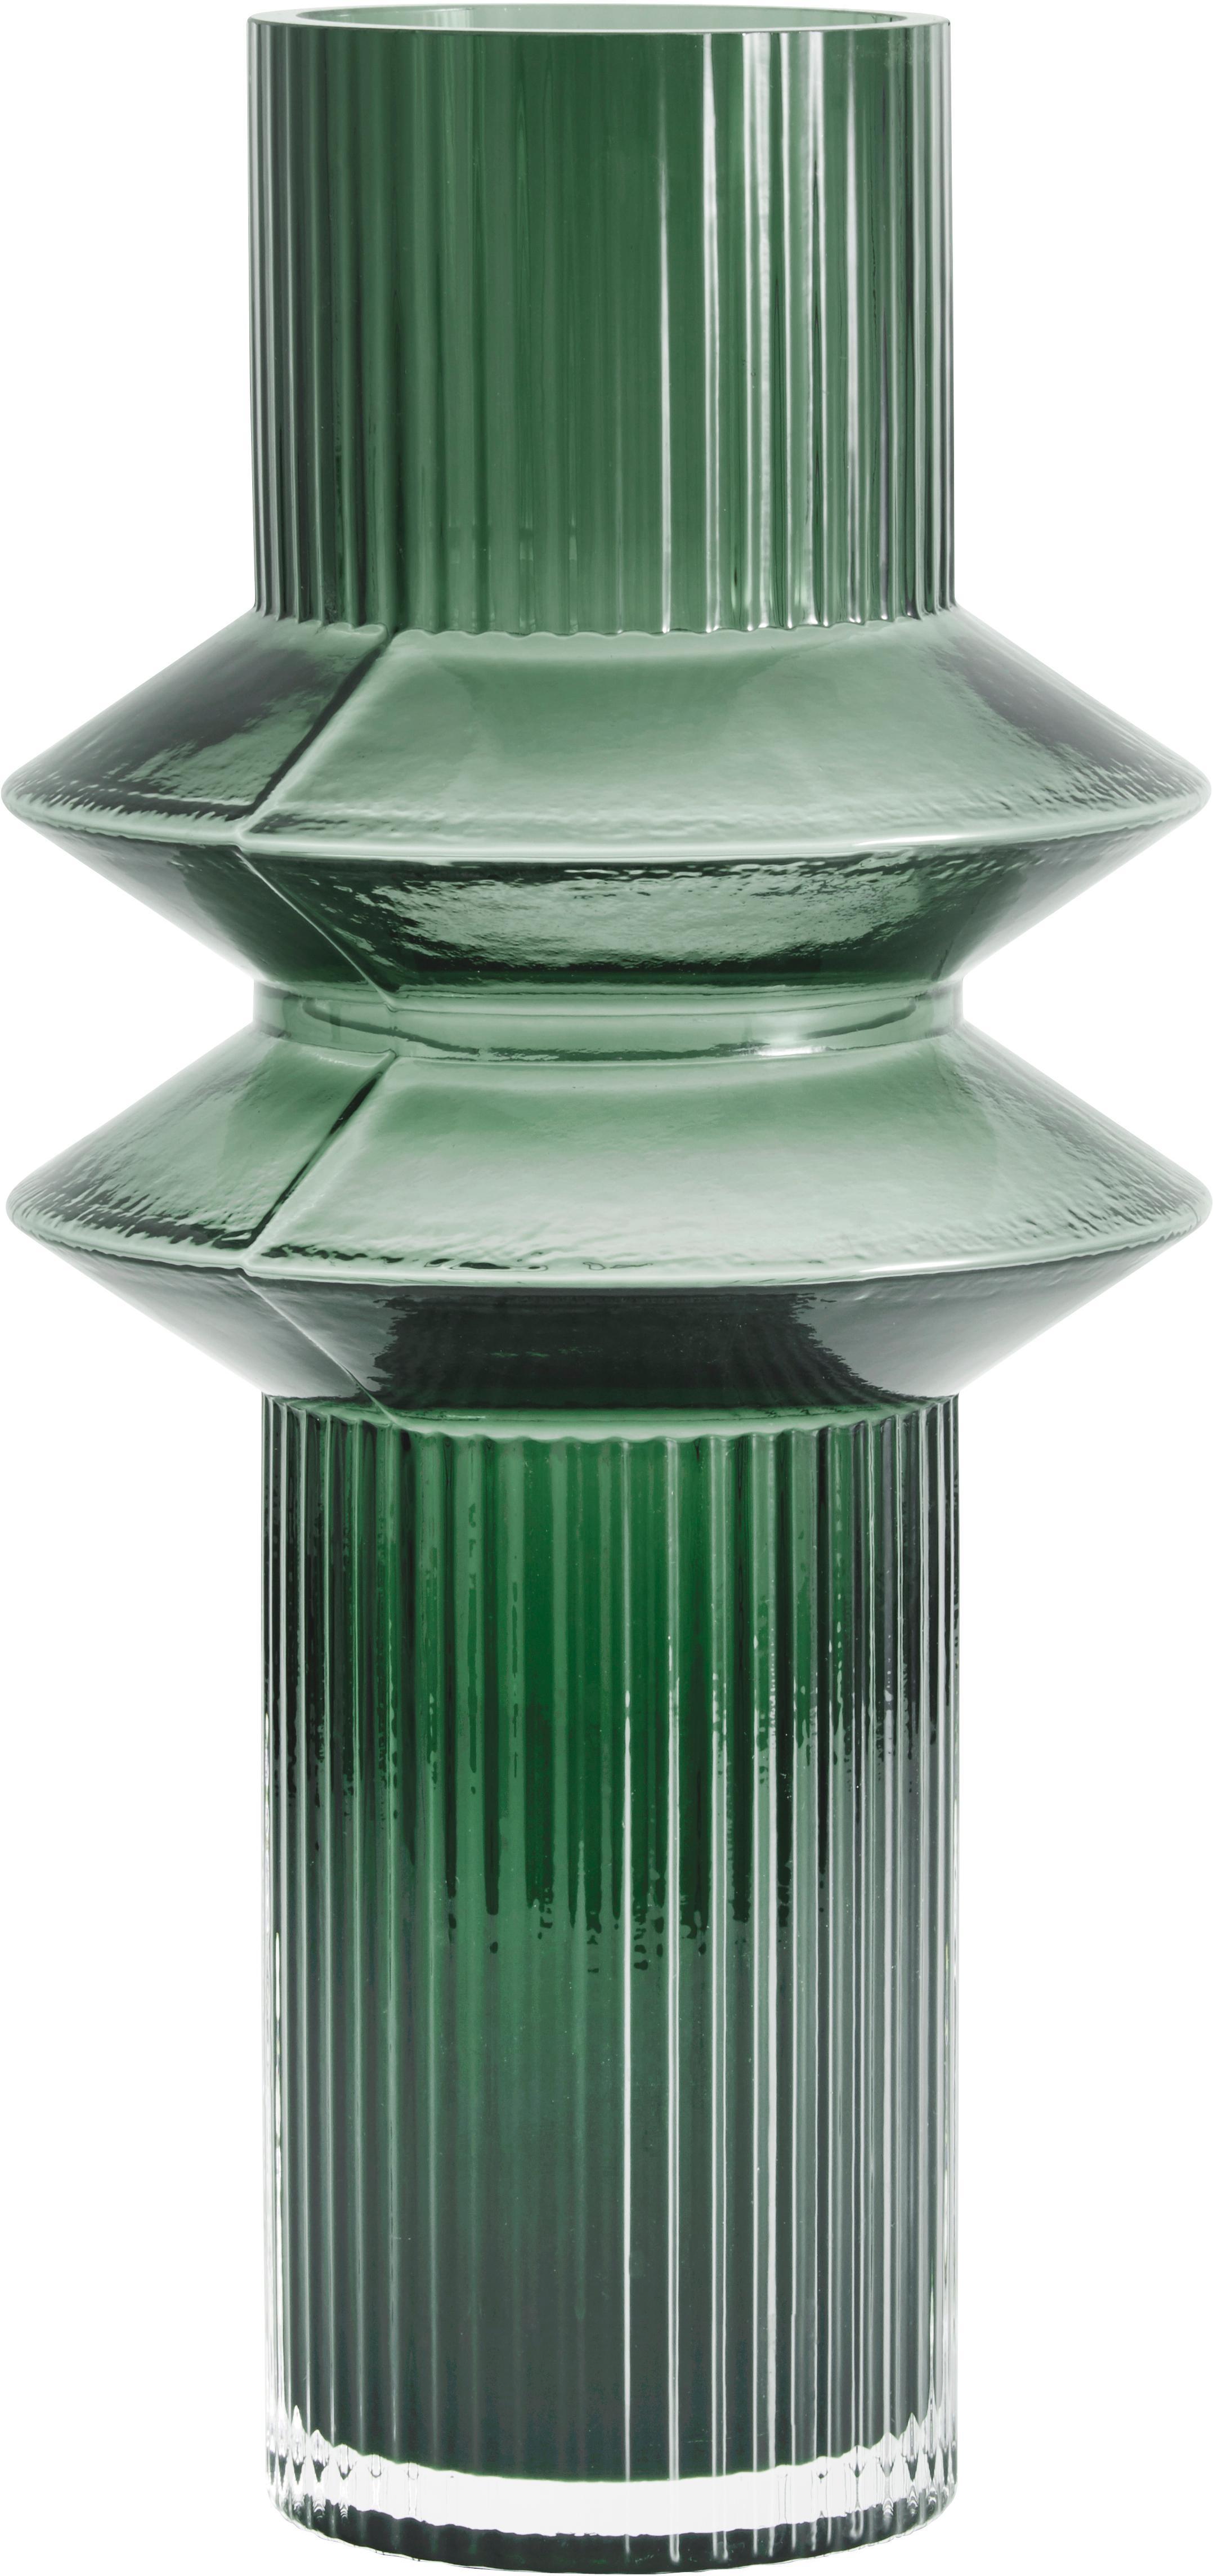 Grote glazen vaas Rilla, Glas, Groen, Ø 9 x H 32 cm